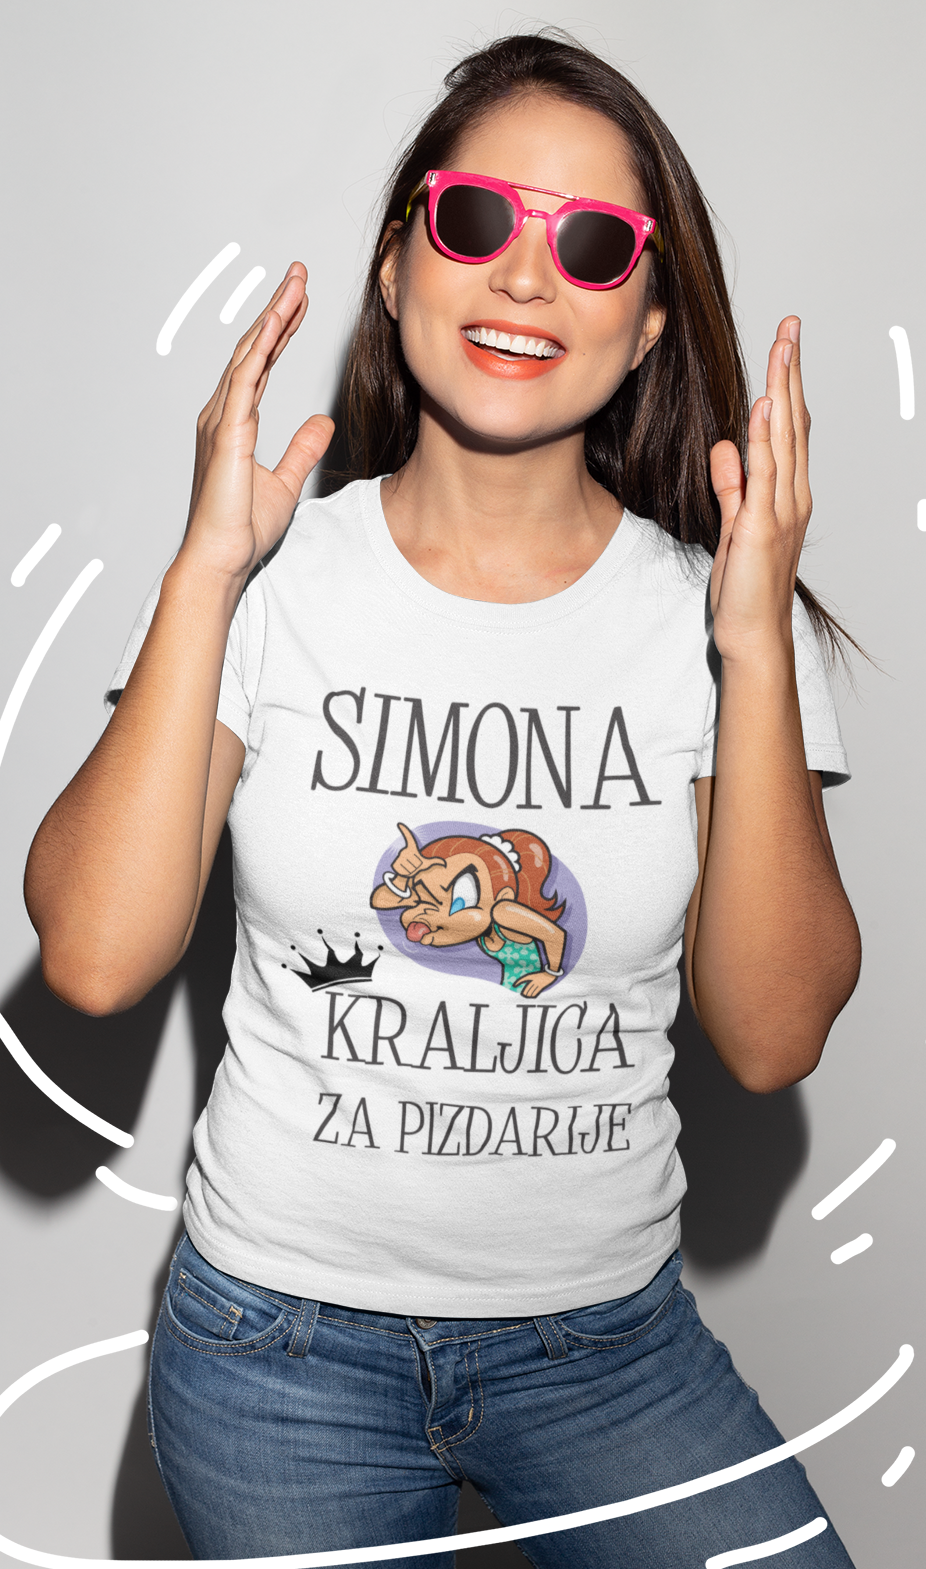 Smešna majica kraljica za pizdarije